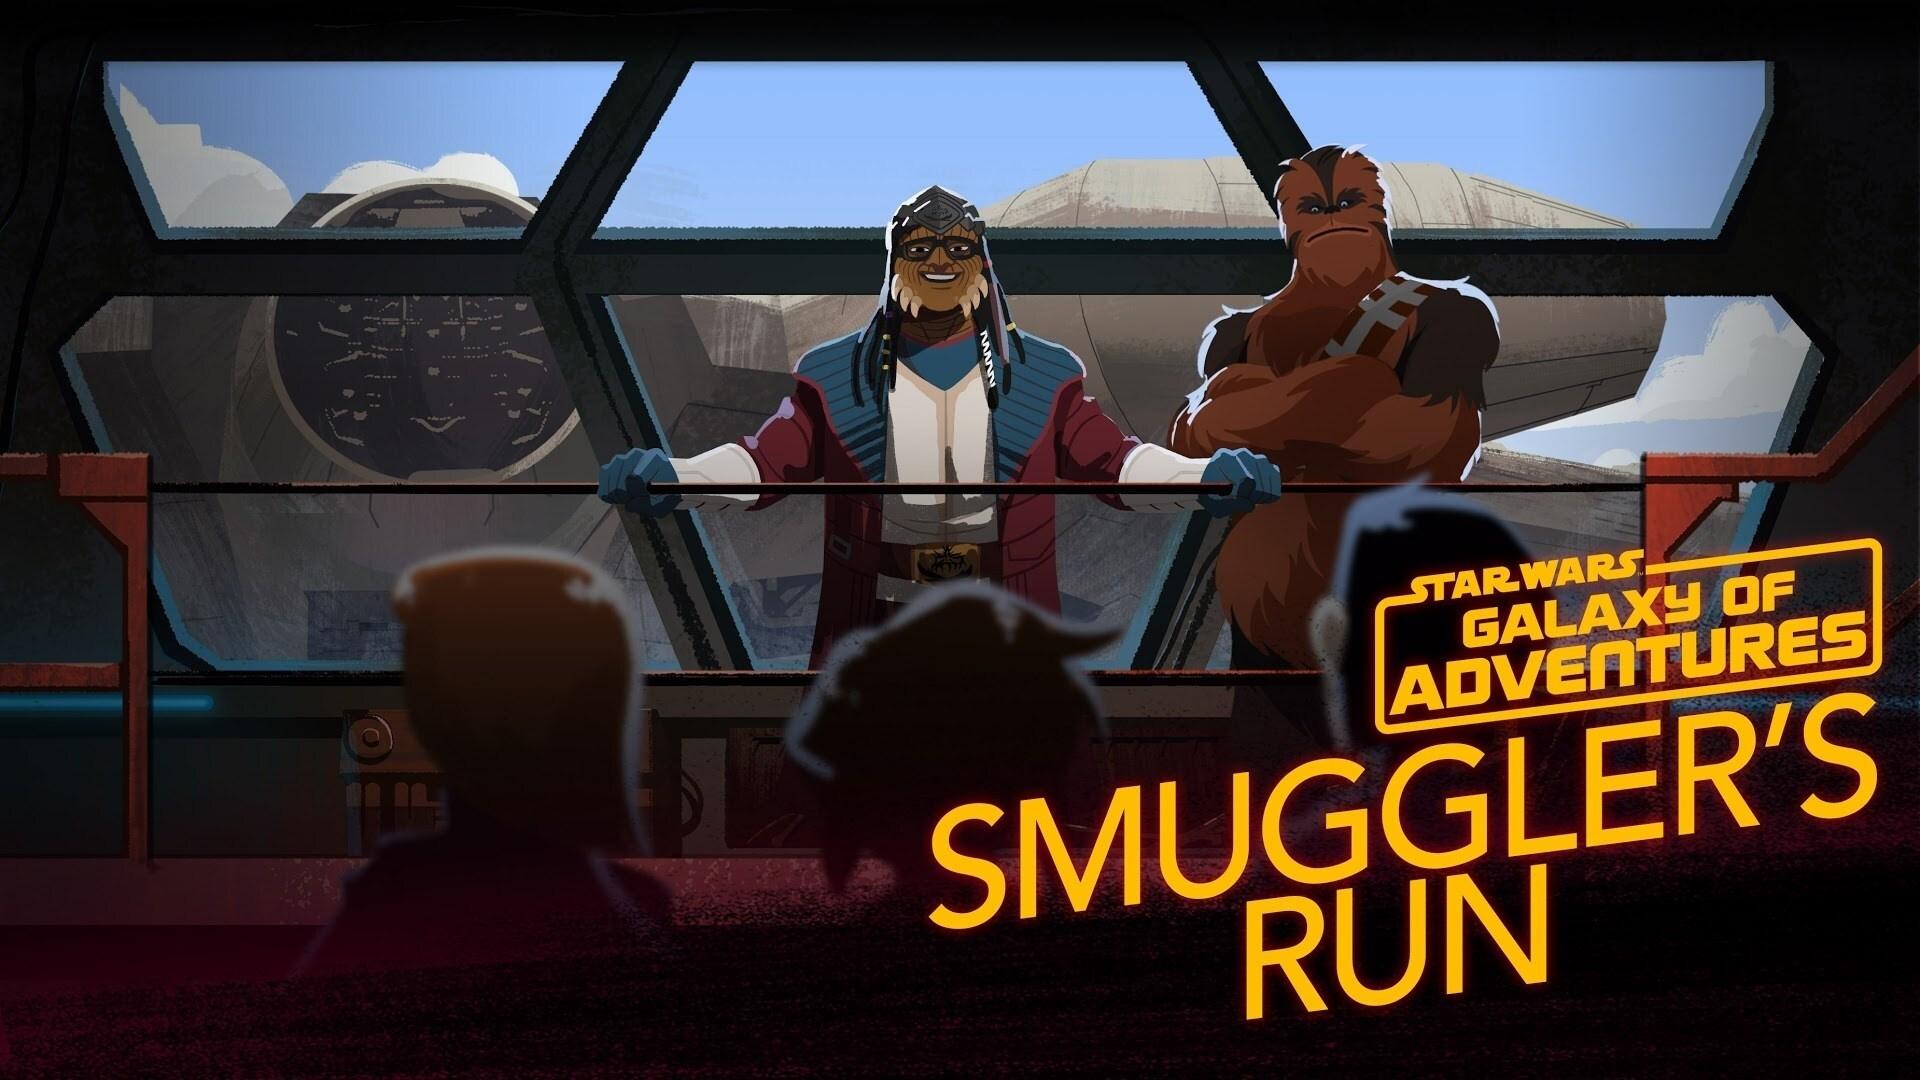 Millennium Falcon - Smugglers Run | Star Wars Galaxy of Adventures